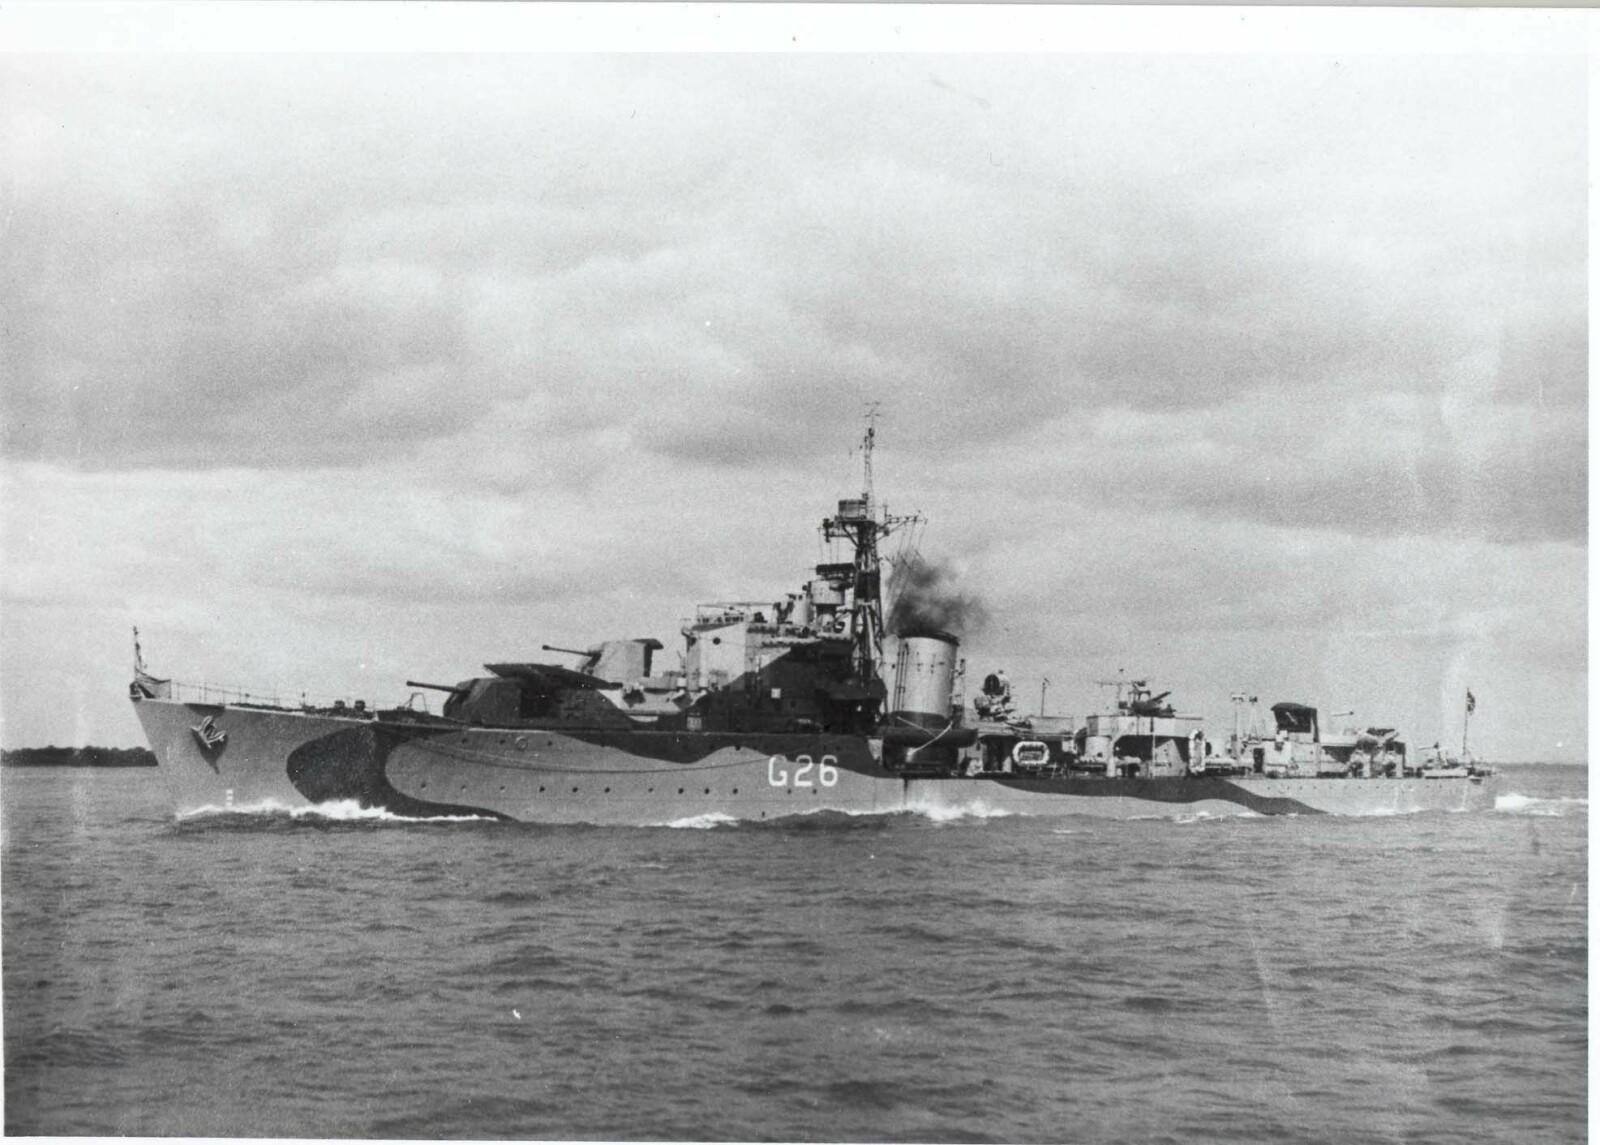 <b>SENTRAL ROLLE:</b> Jageren «Stord» med norsk mannskap med kallenavnet «Lucky 26» hadde en sentral rolle under D-Dagen i Normandie i 1944.